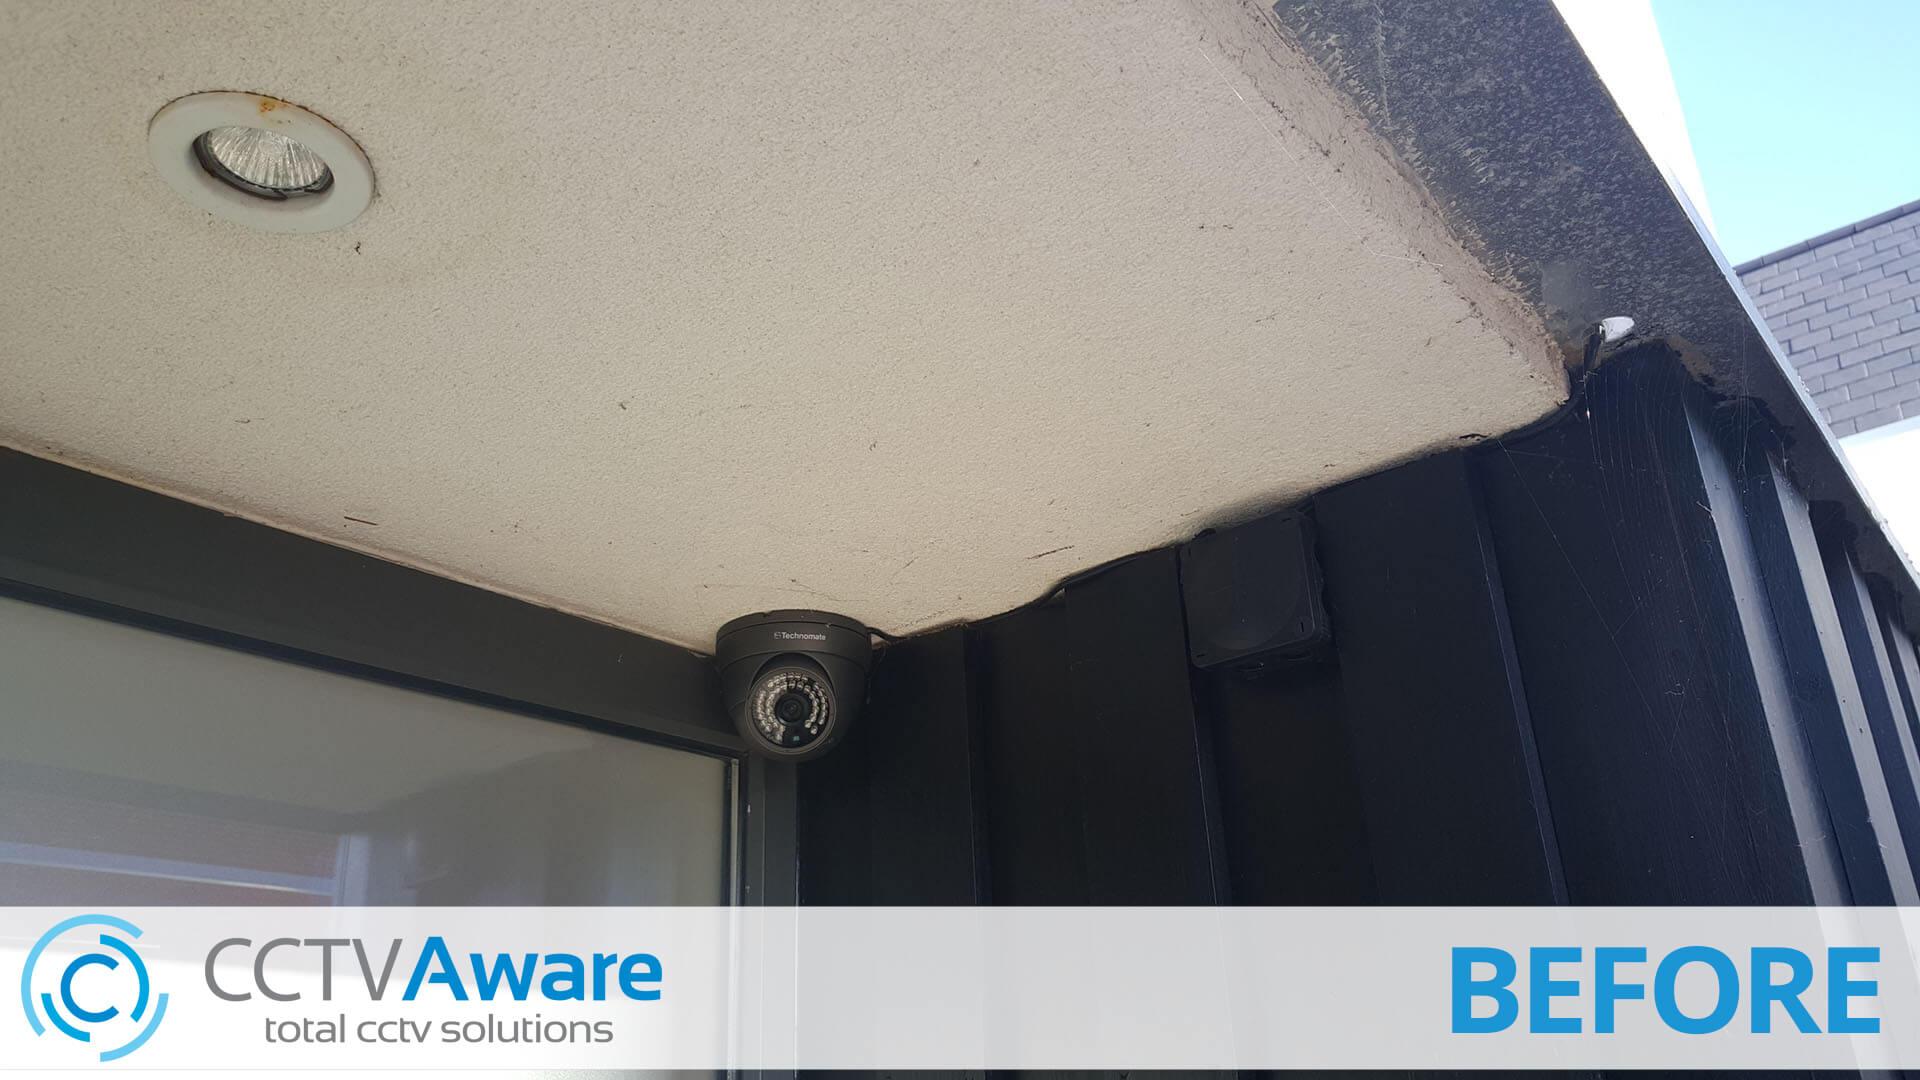 Rogue CCTV Installers in Essex